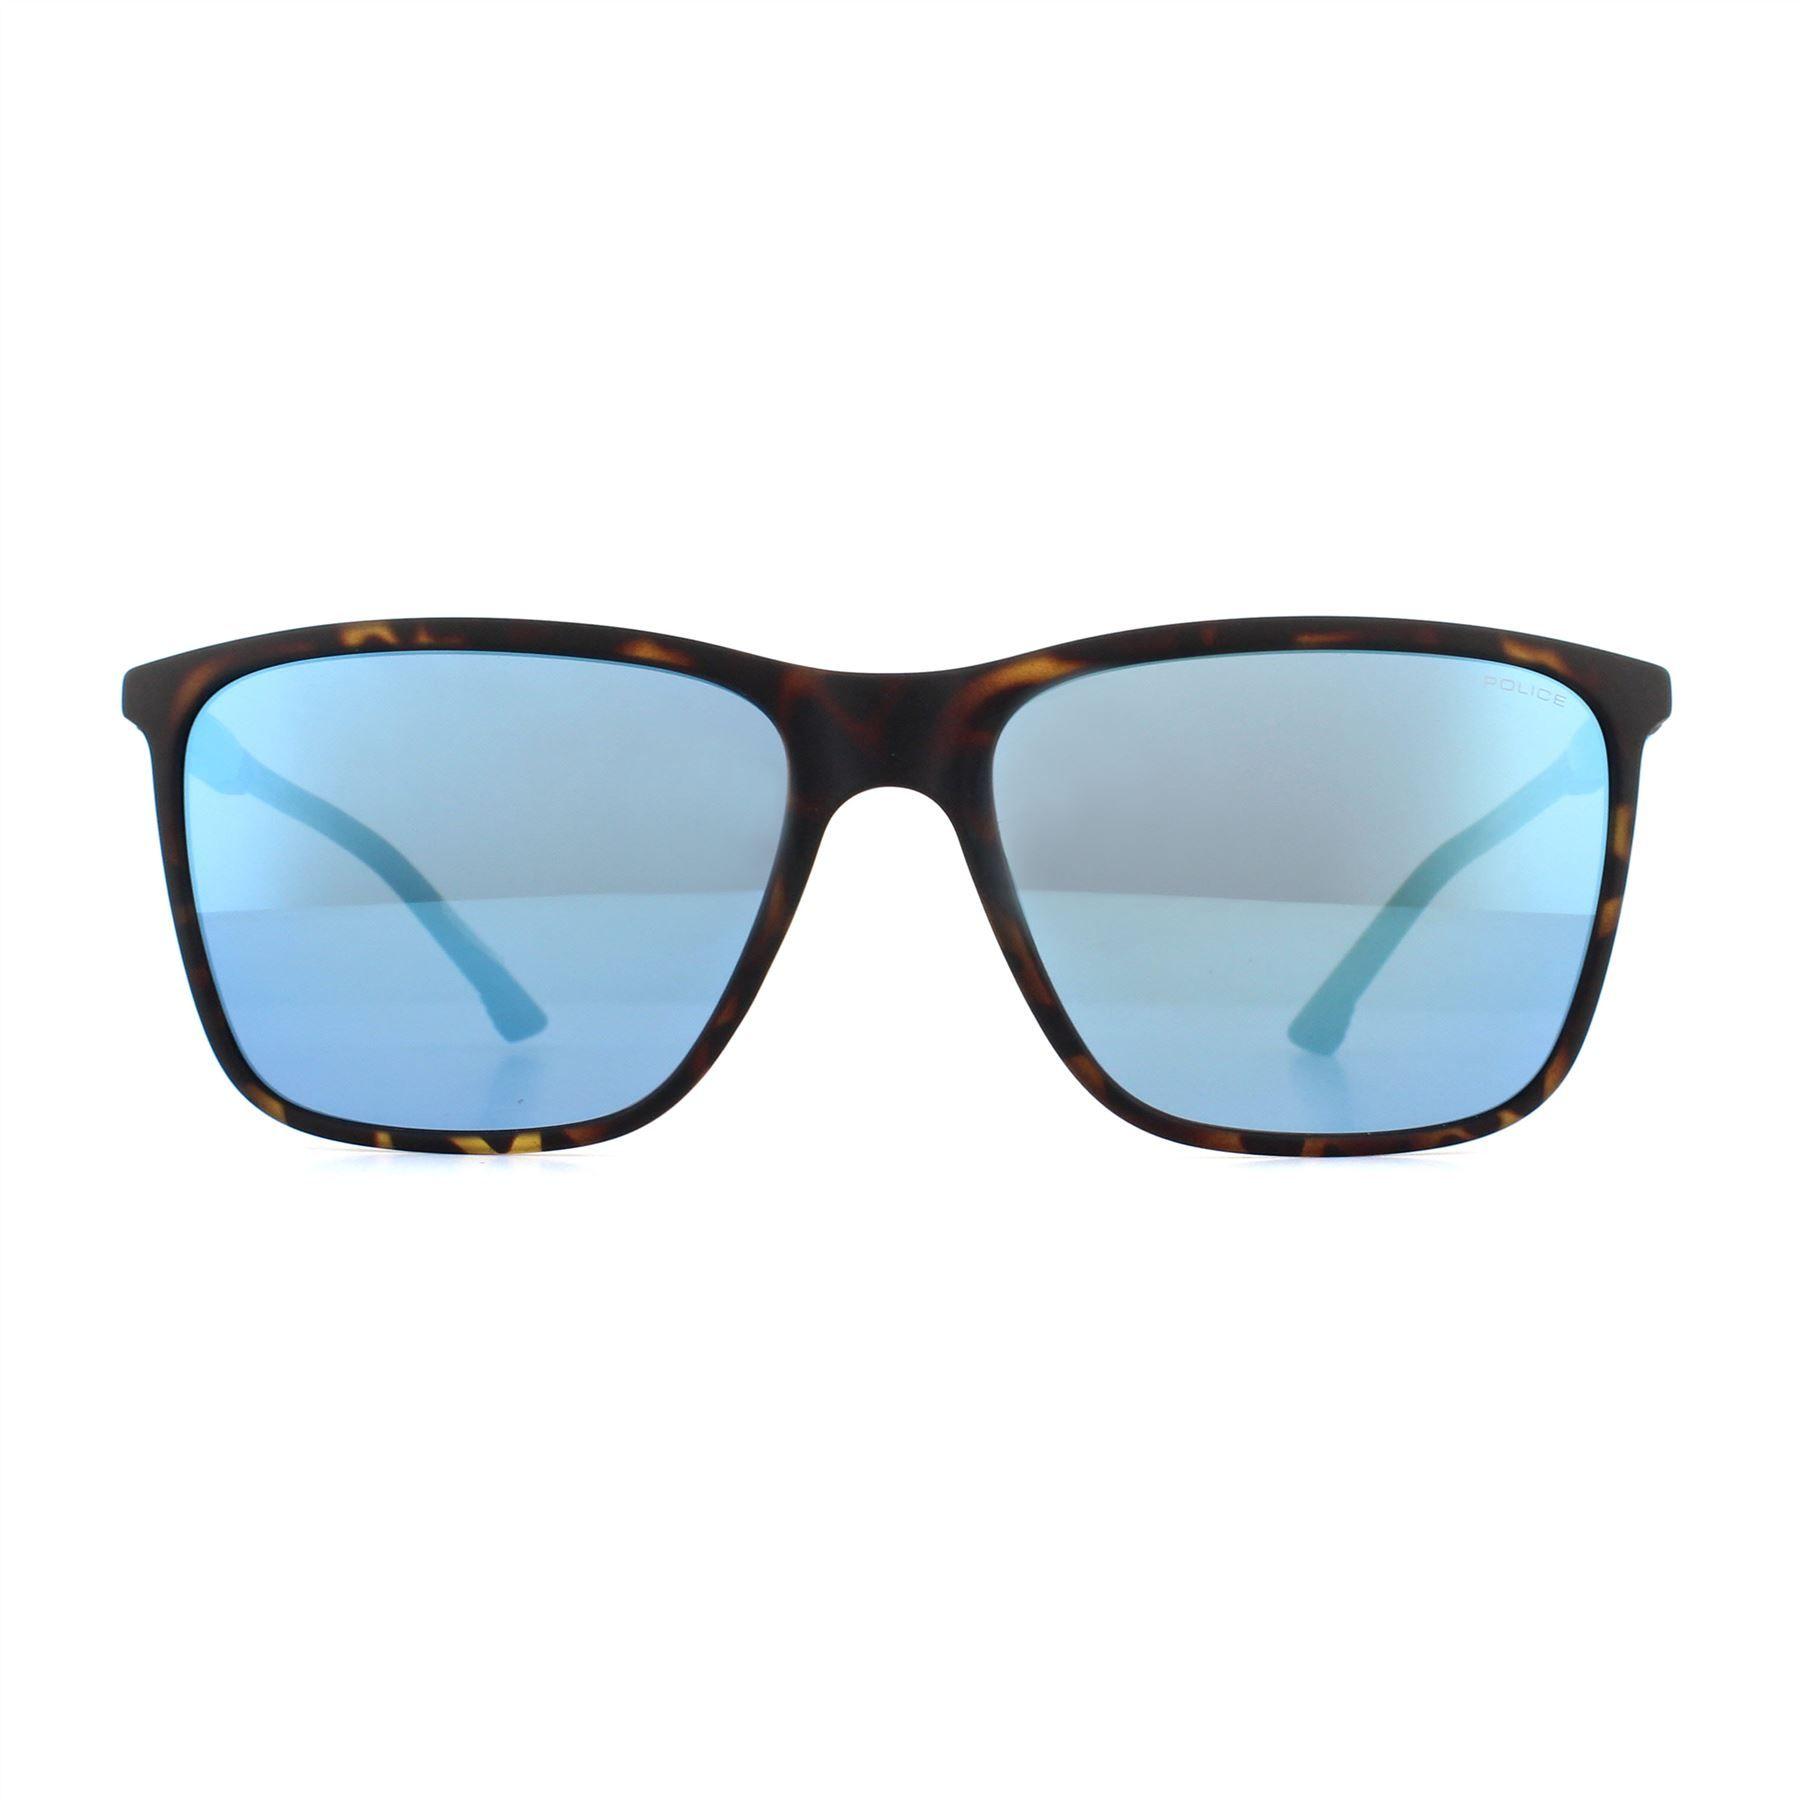 Police Sunglasses SPL716 Storm Light 1 878B Dark Havana & Blue Blue Mirror